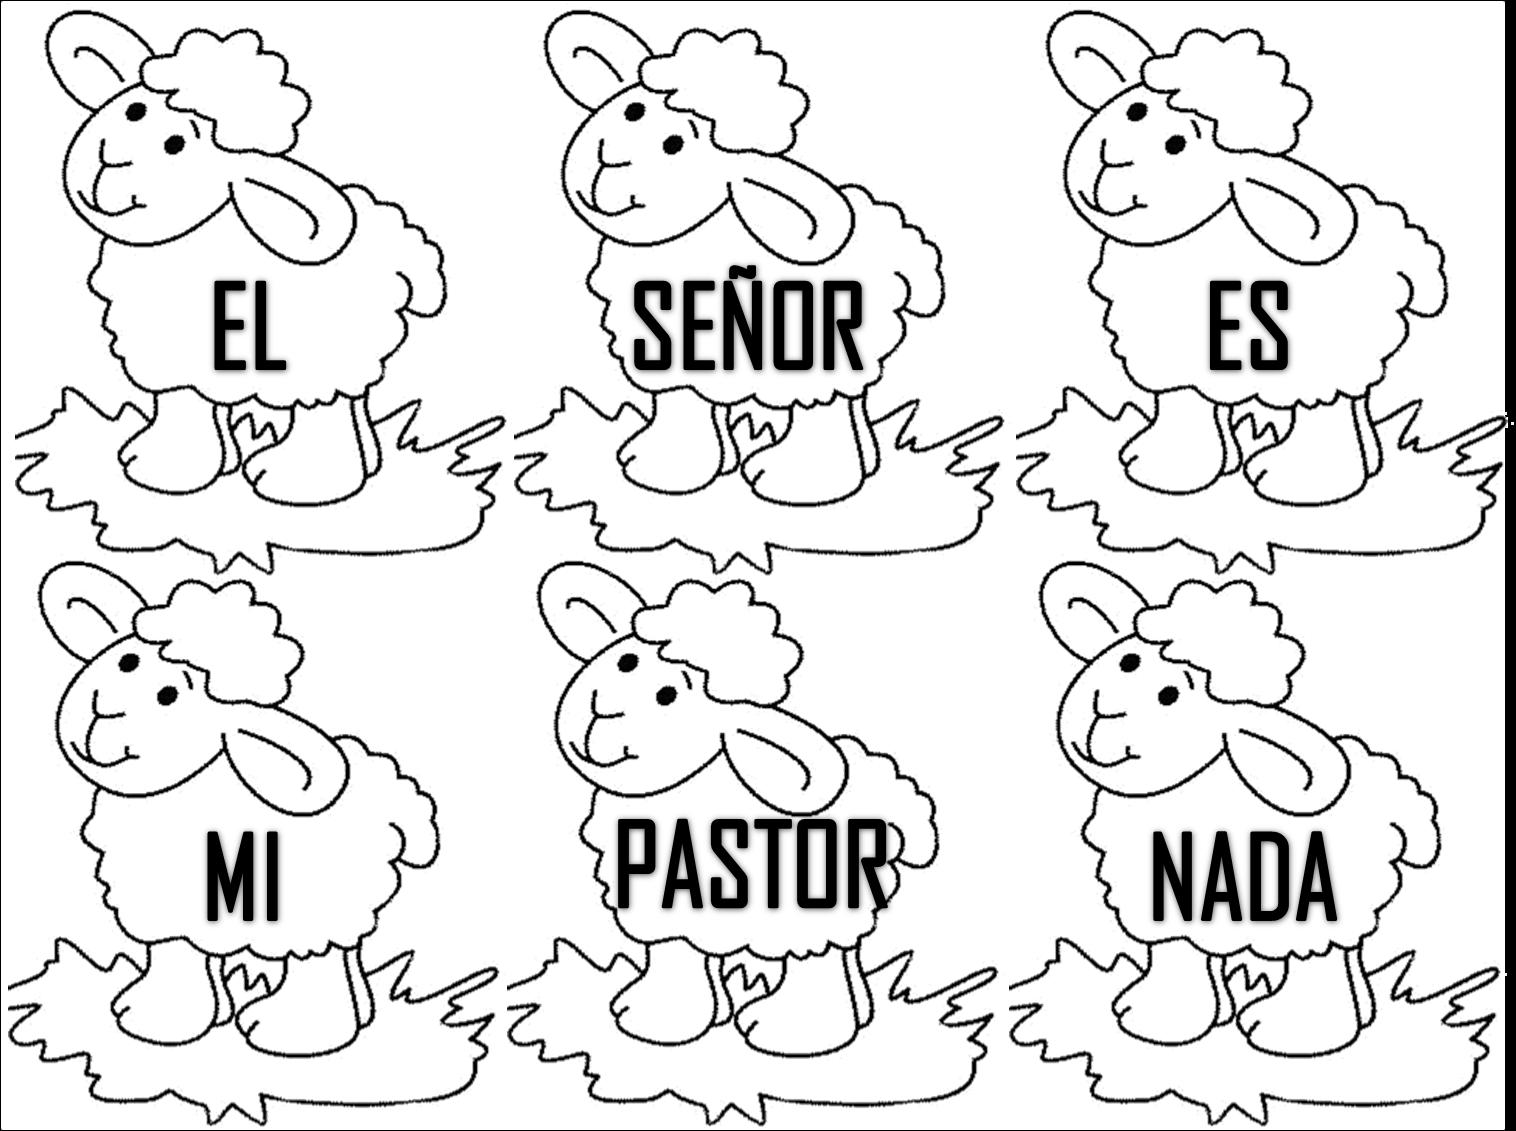 CLASES BIBLICAS VISUALIZADAS: Manualidades